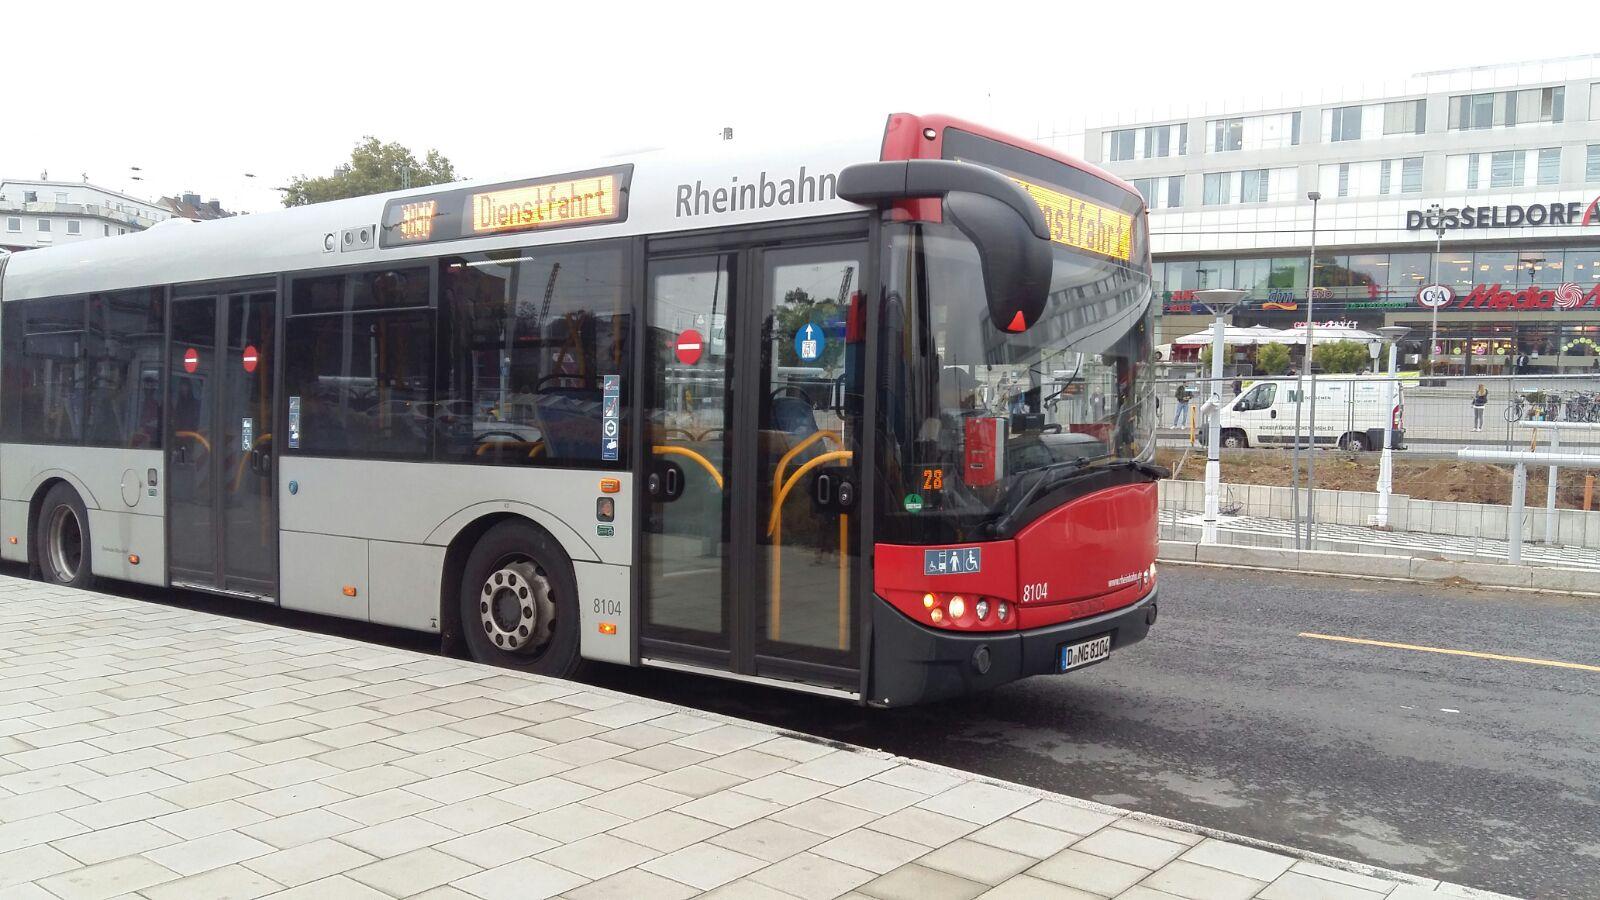 Sommerbaustellen behindern den Bussverkehr. (Foto: xity)